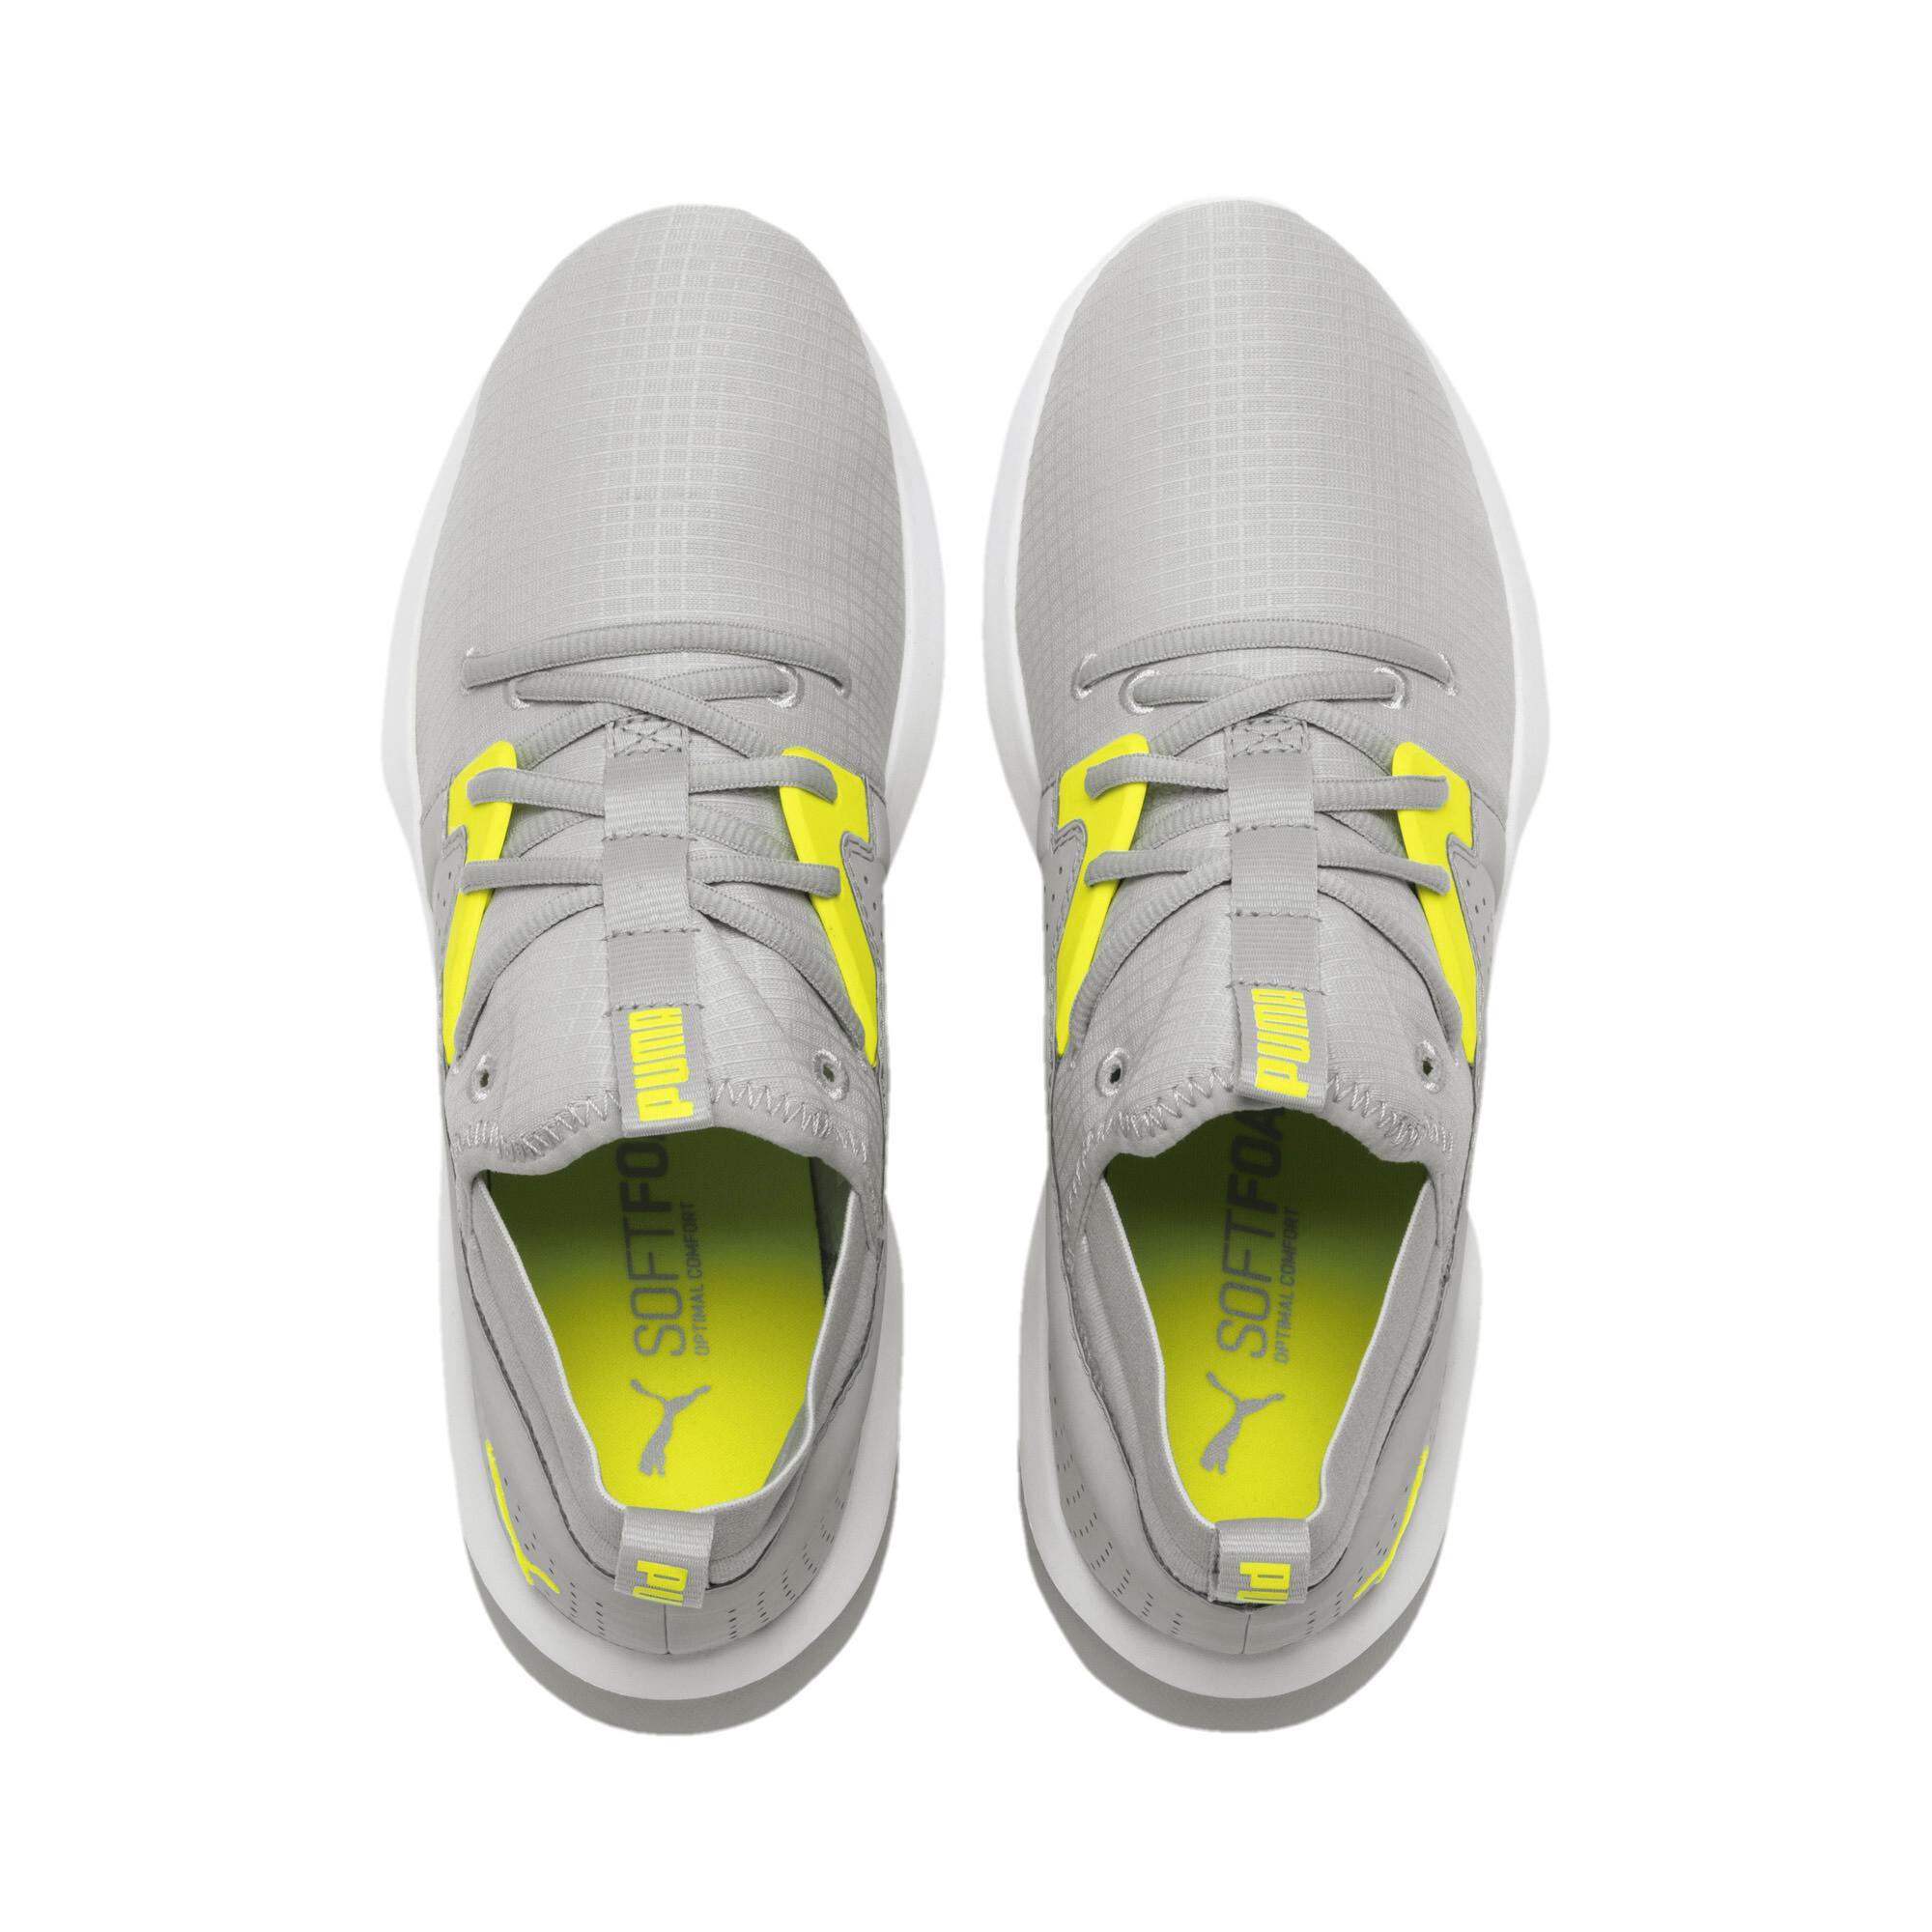 PUMA-Emergence-Lights-Men-039-s-Training-Shoes-Men-Shoe-Running thumbnail 8